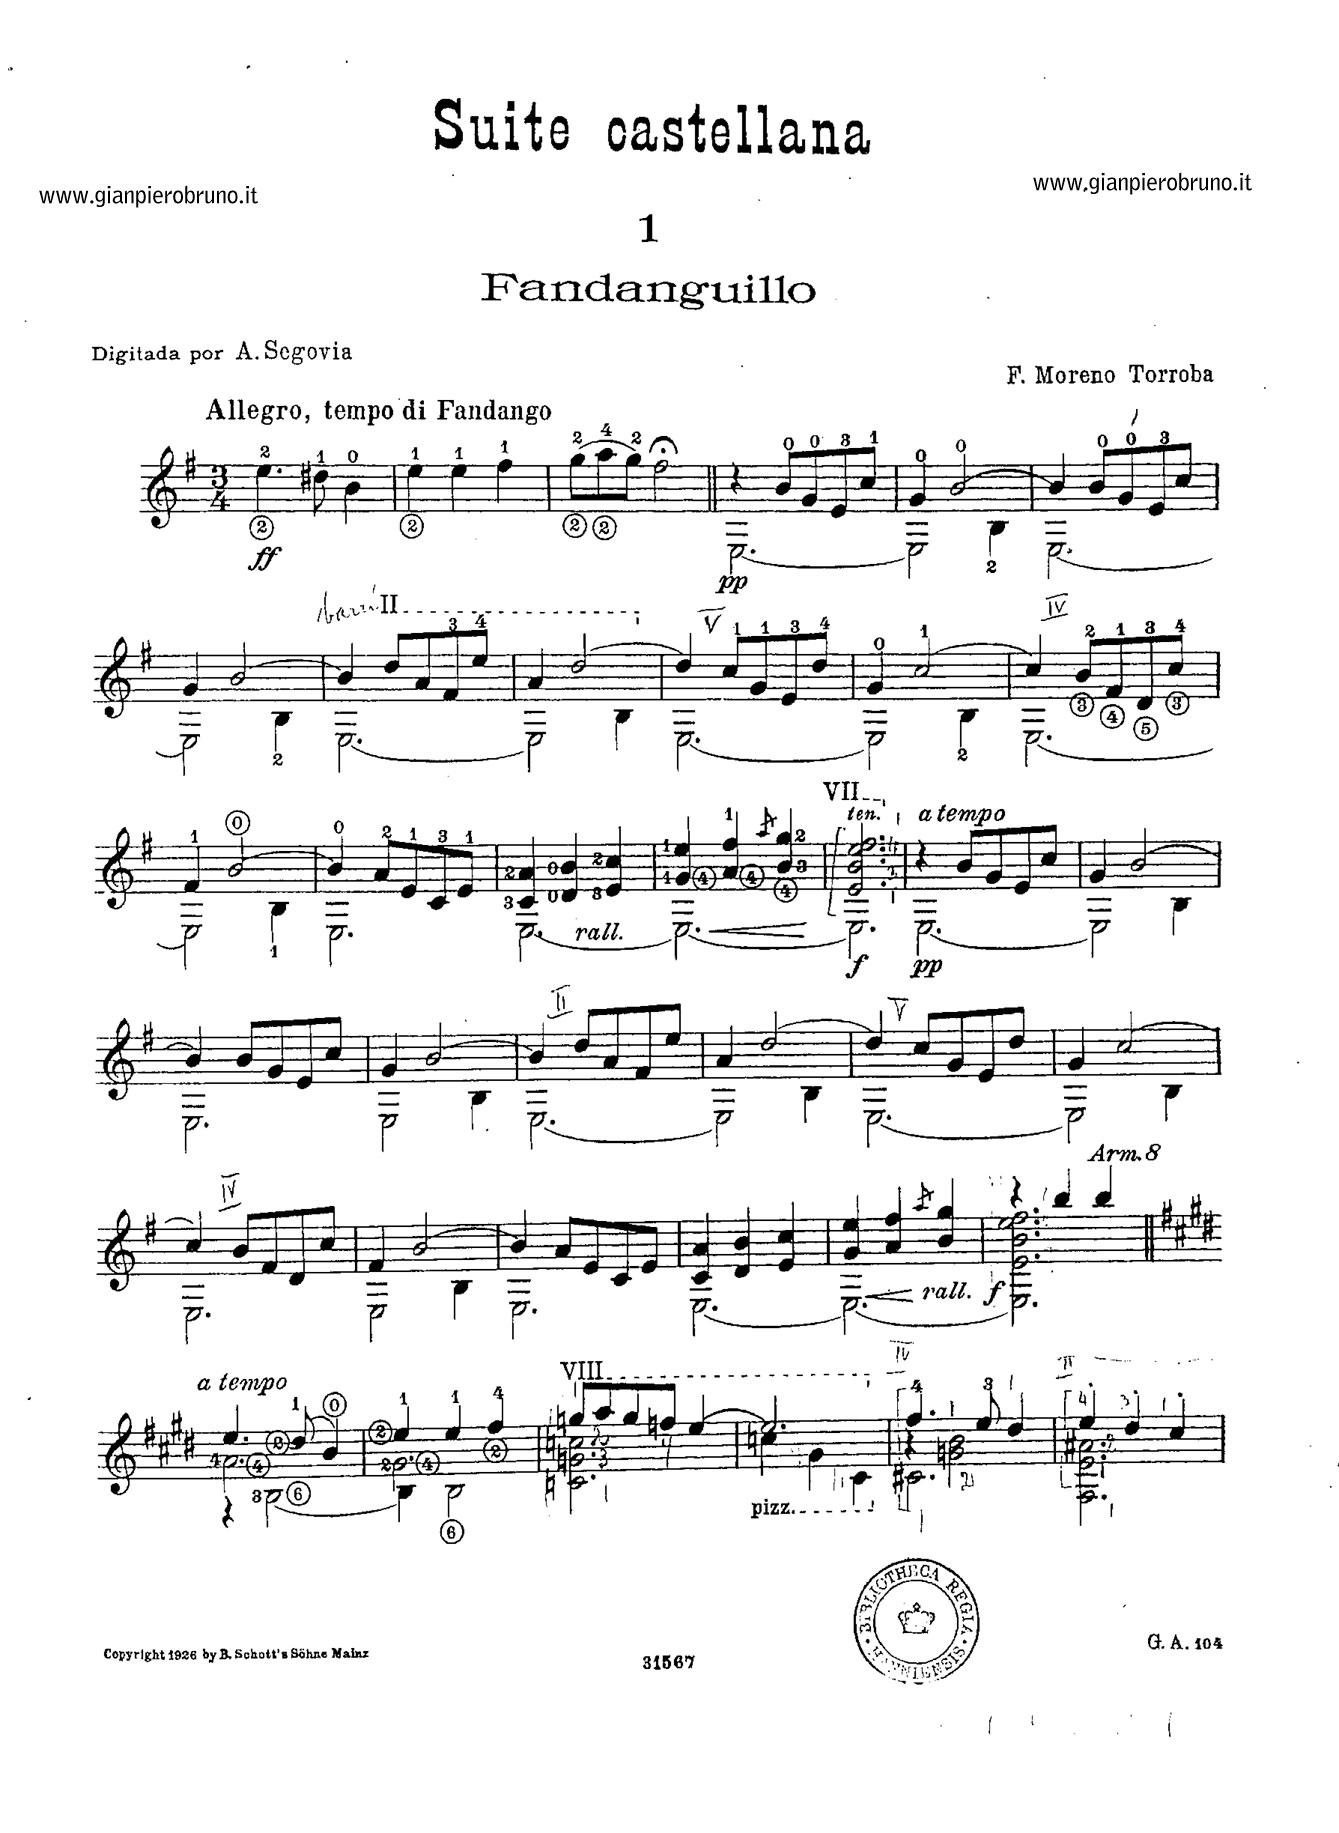 Partiture chitarra classica